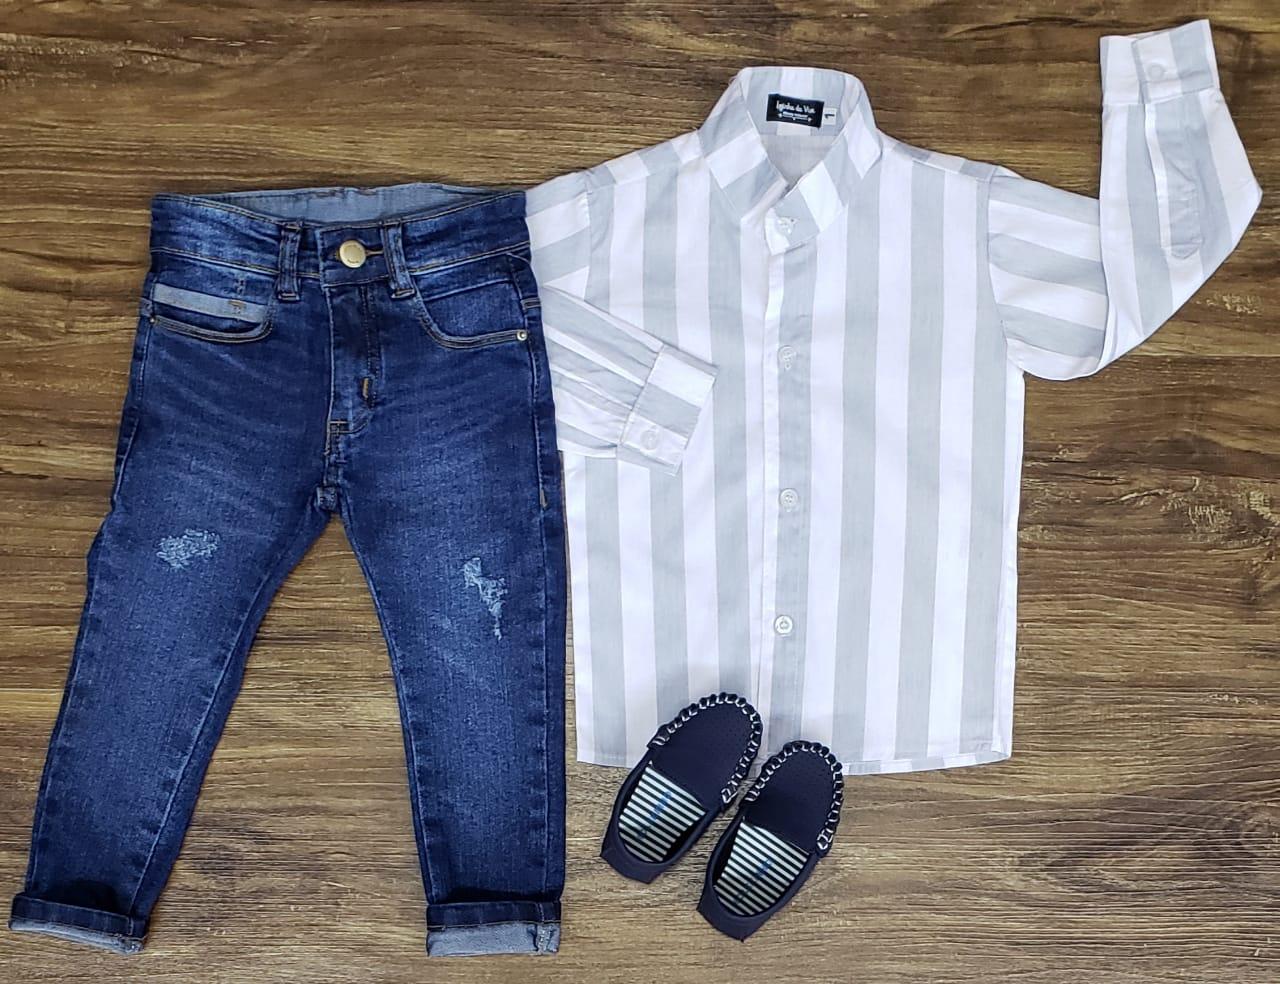 Calça Jeans com Camisa Listrada Manga Longa